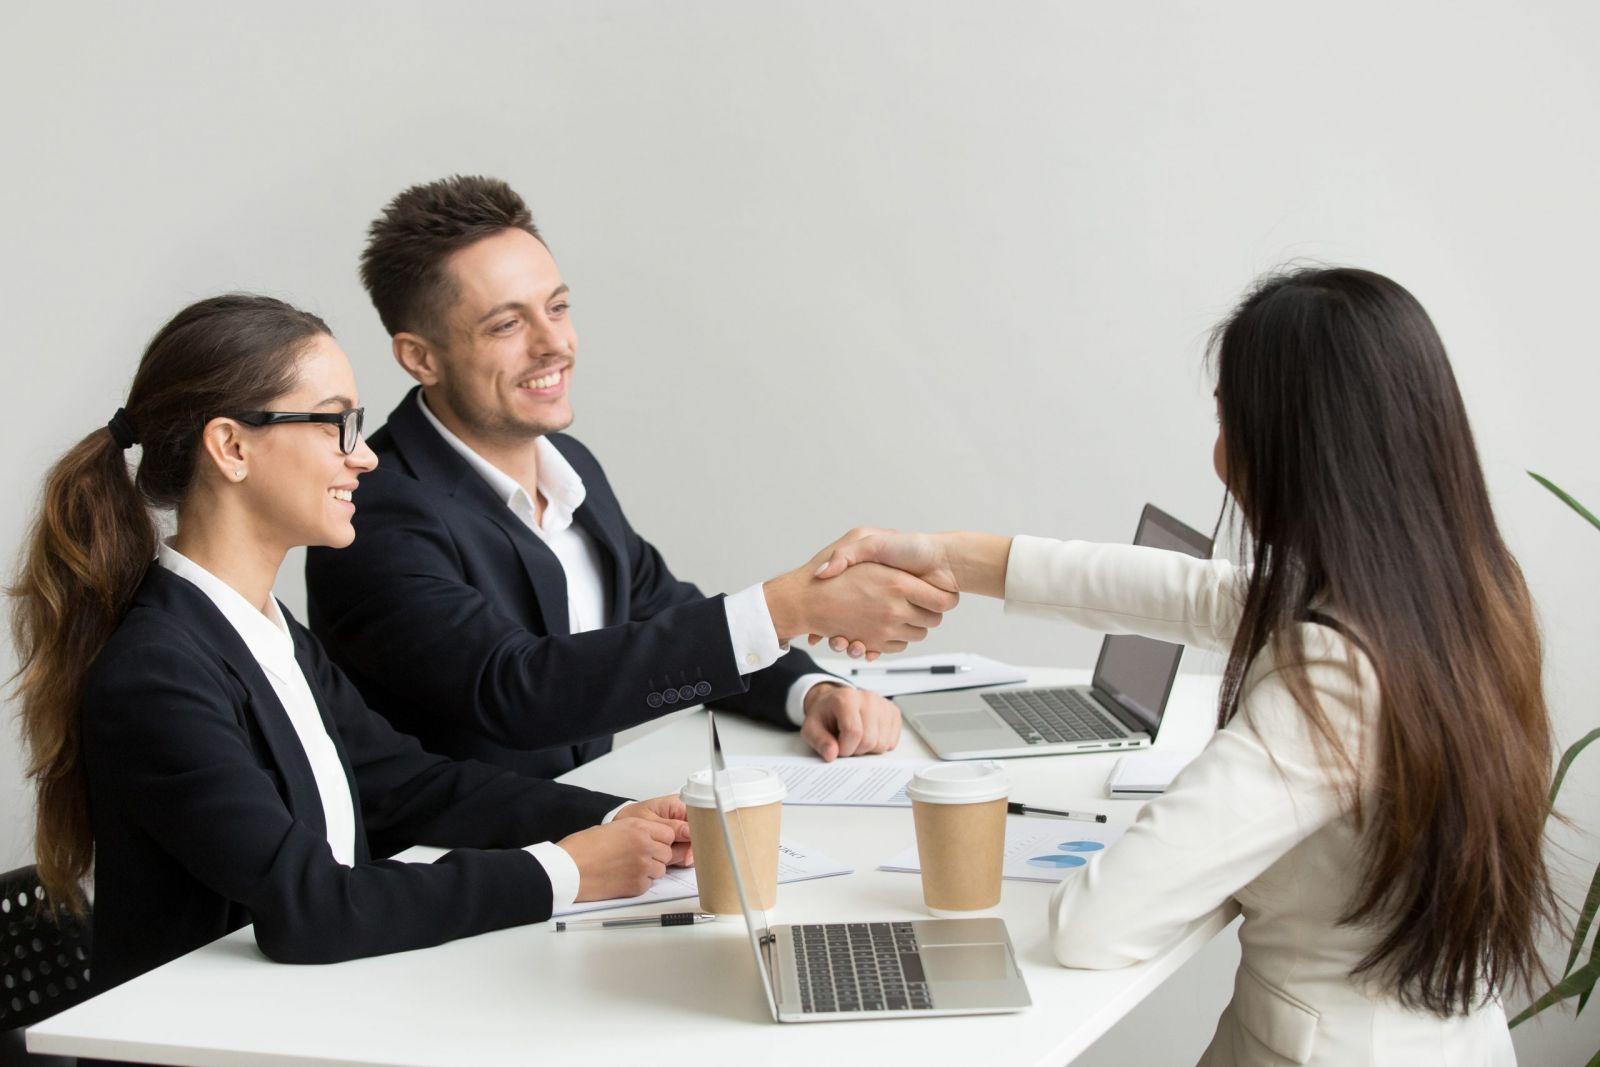 Права и обязанности созаемщика по ипотечному кредиту